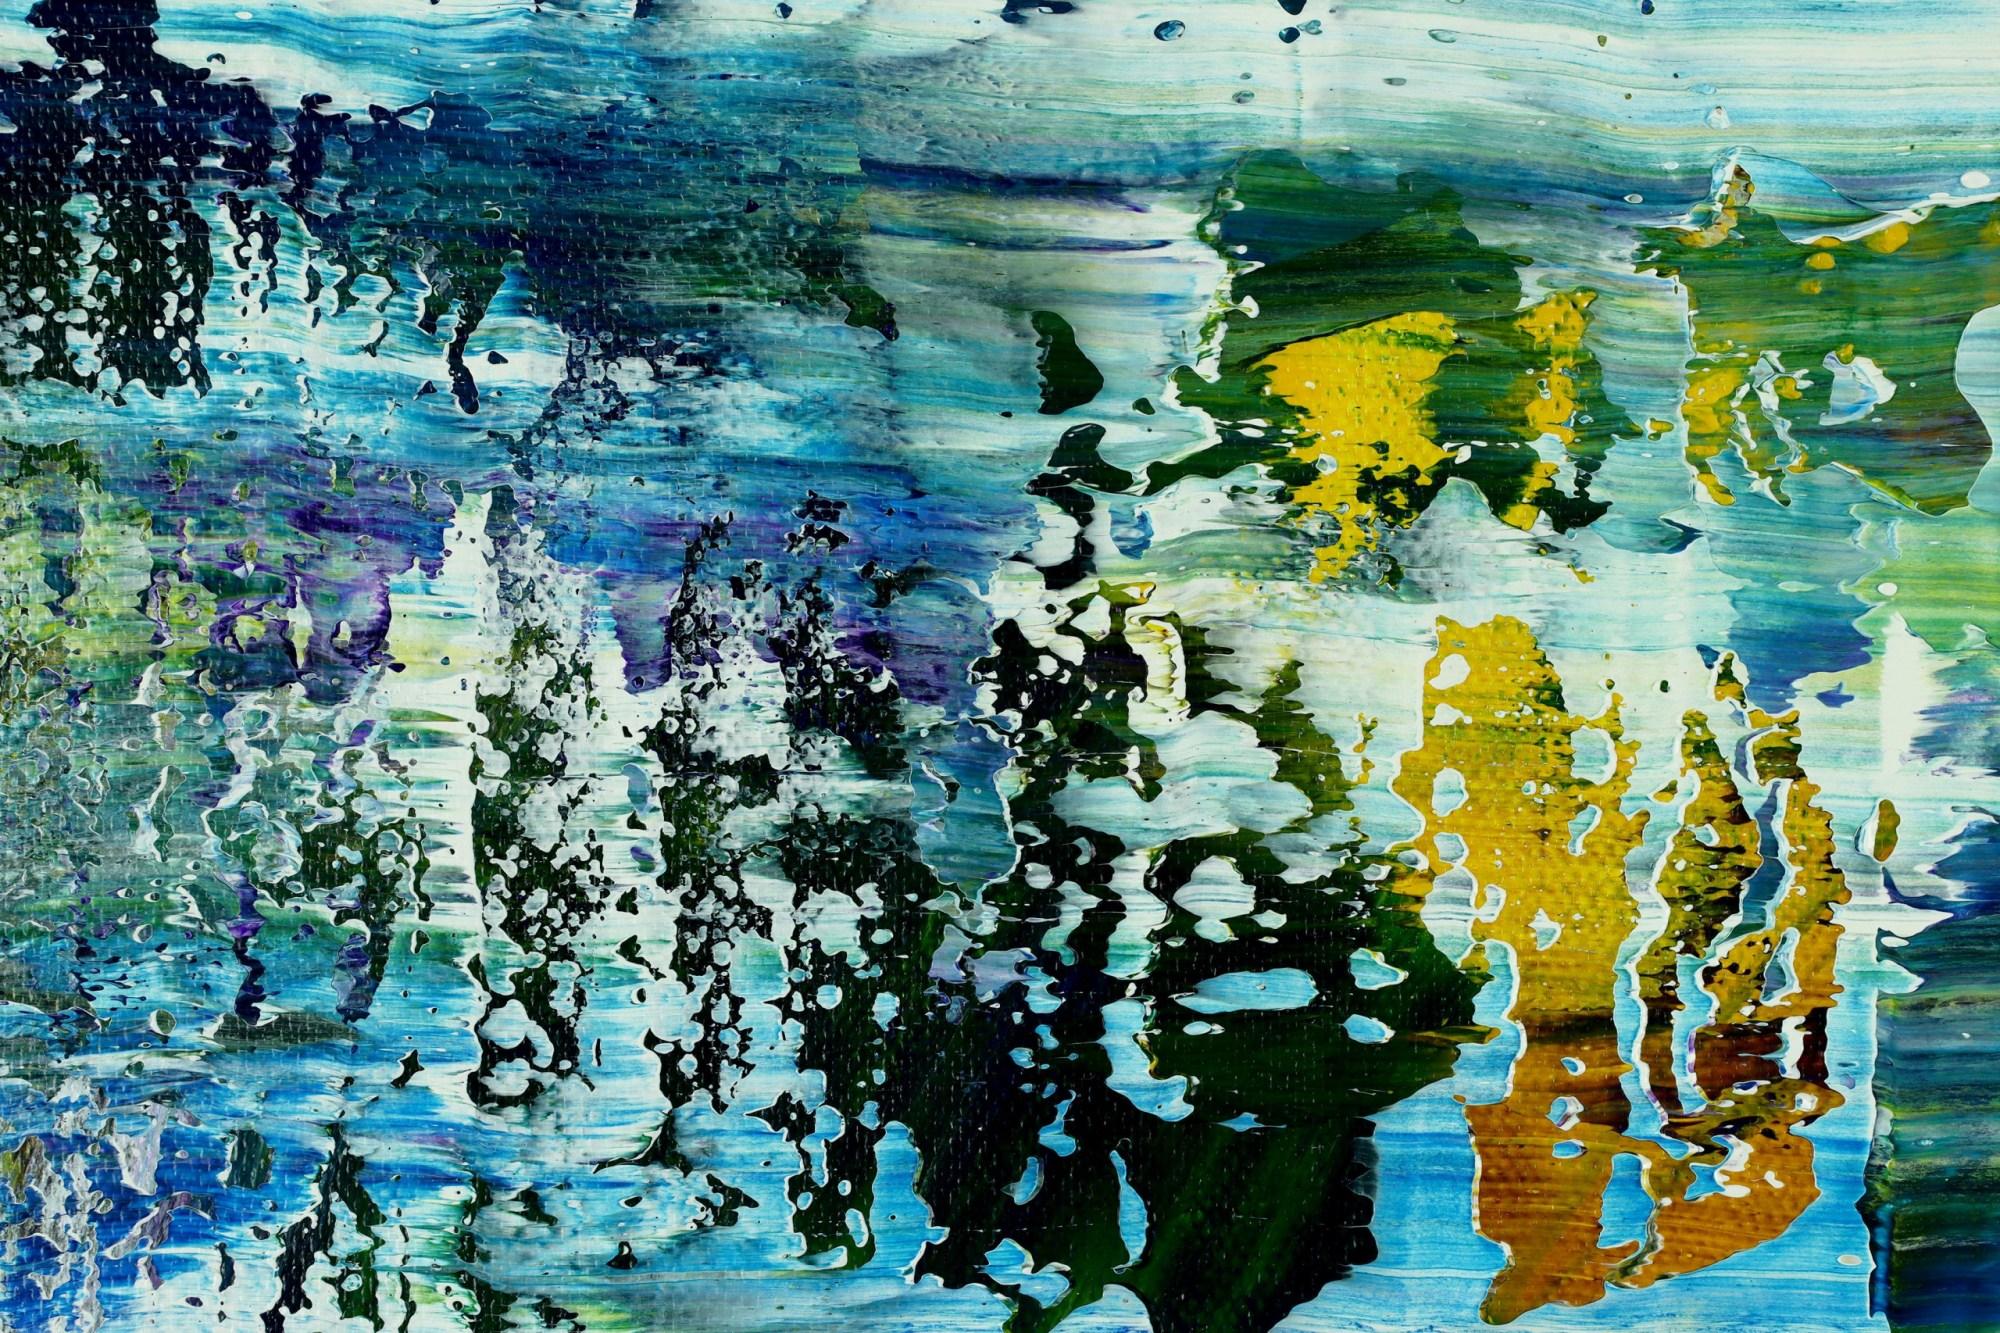 DETAIL / Under Water (Caribbean Ocean) (2021) / Artist: Nestor Toro